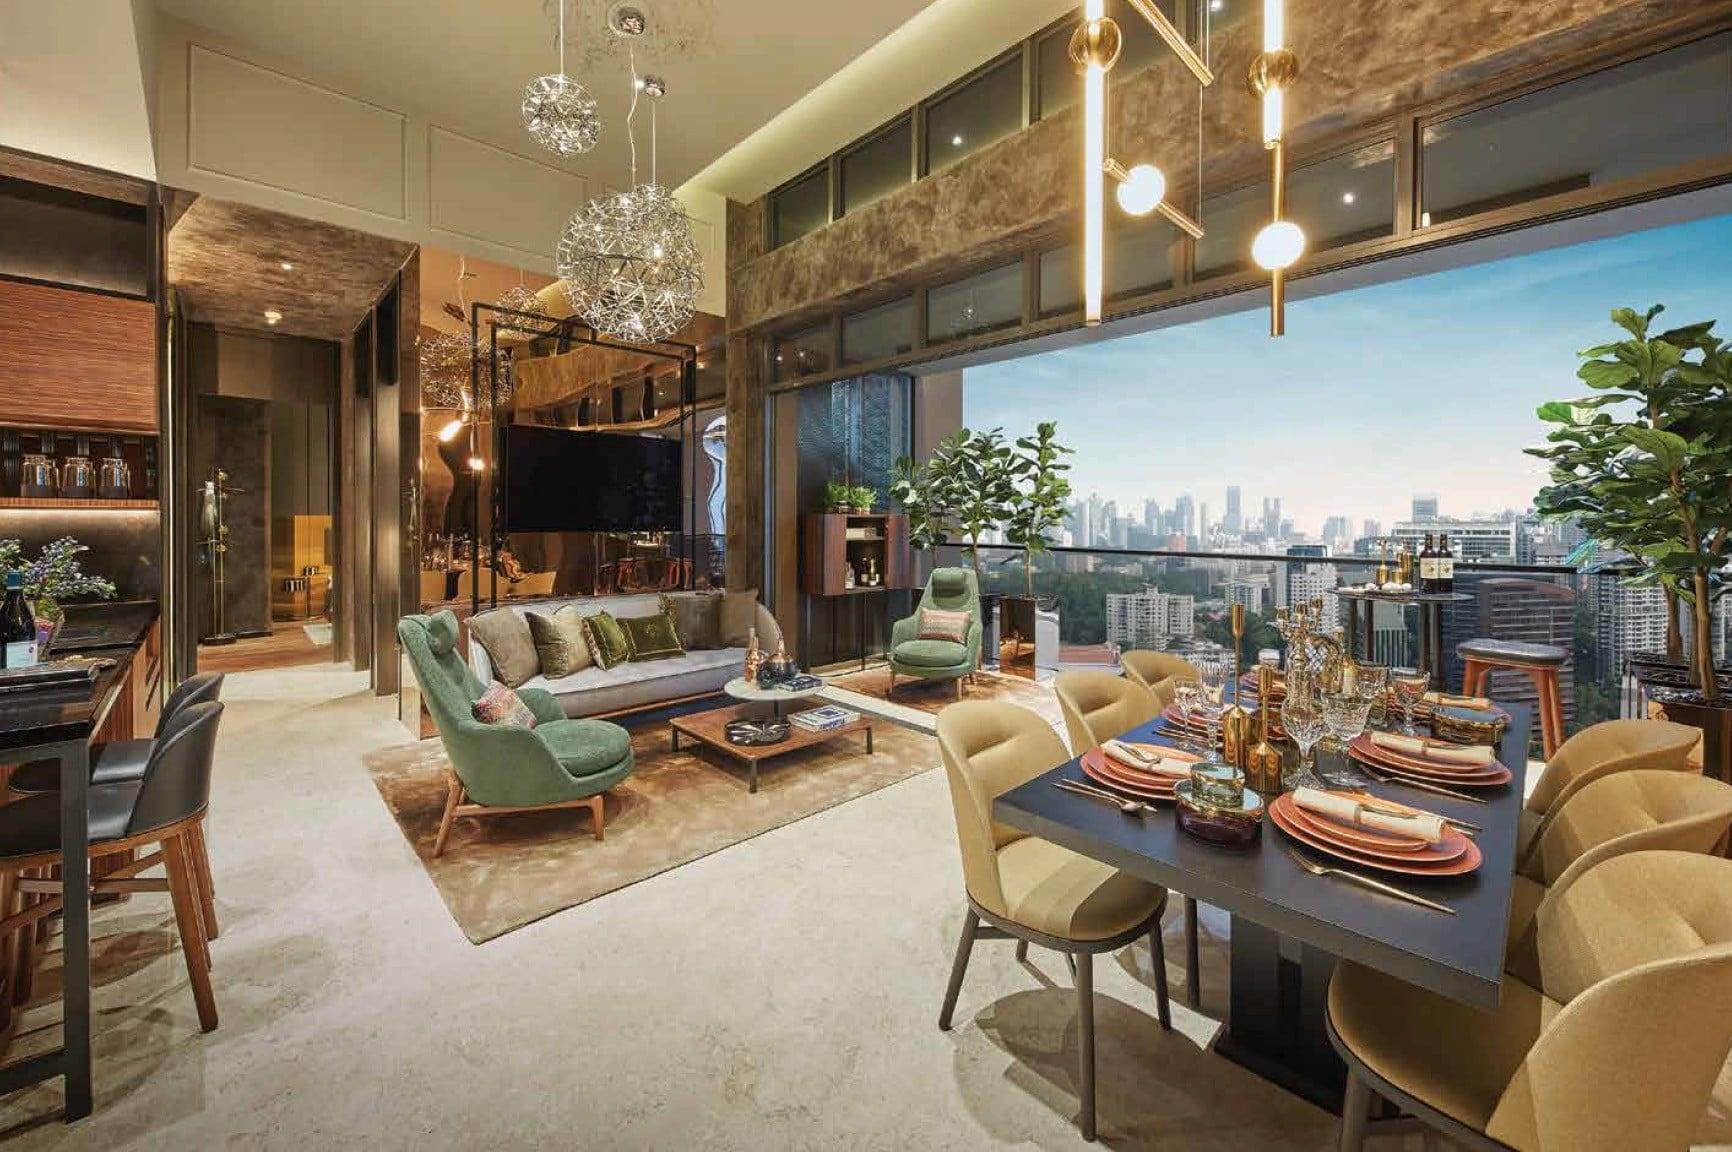 Pullman-Residences-Newton-Living room